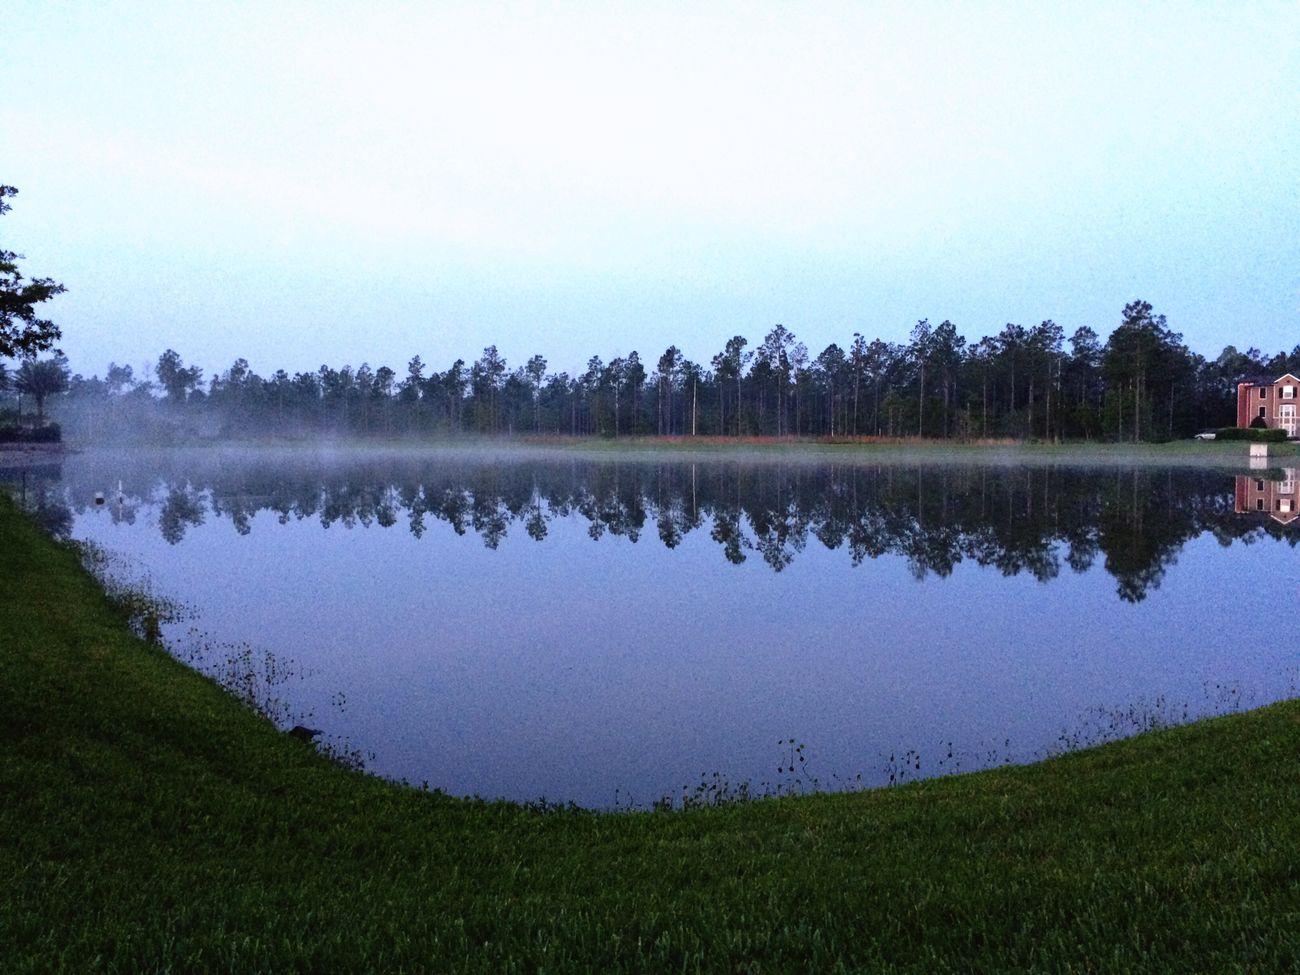 Pond Lake Mist Misty Morning Foggy taken 2015